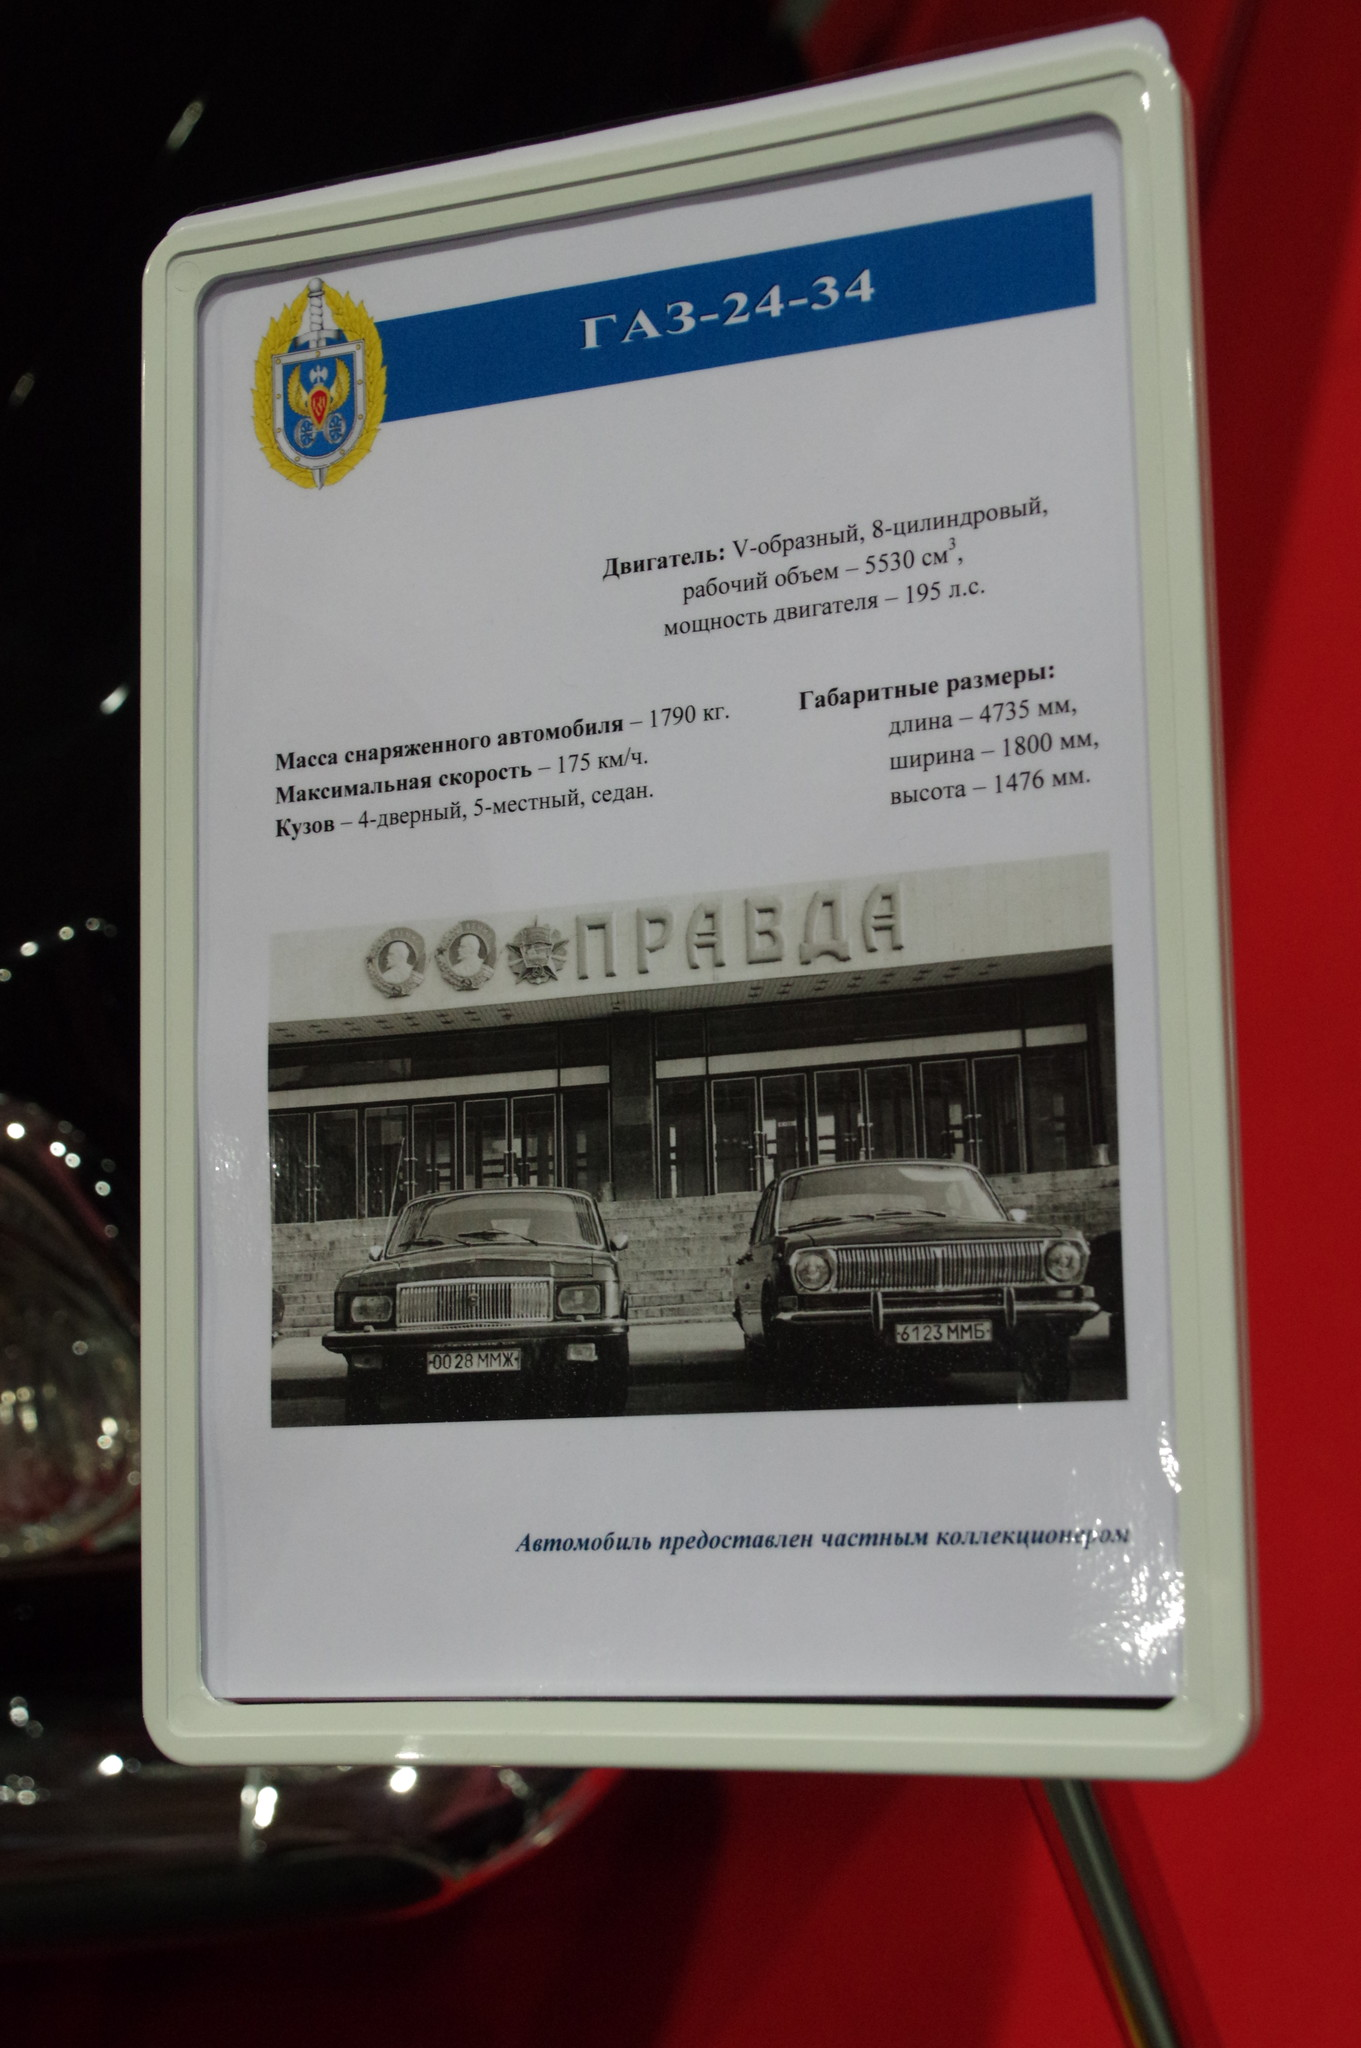 Автомобиль ГАЗ-24-34